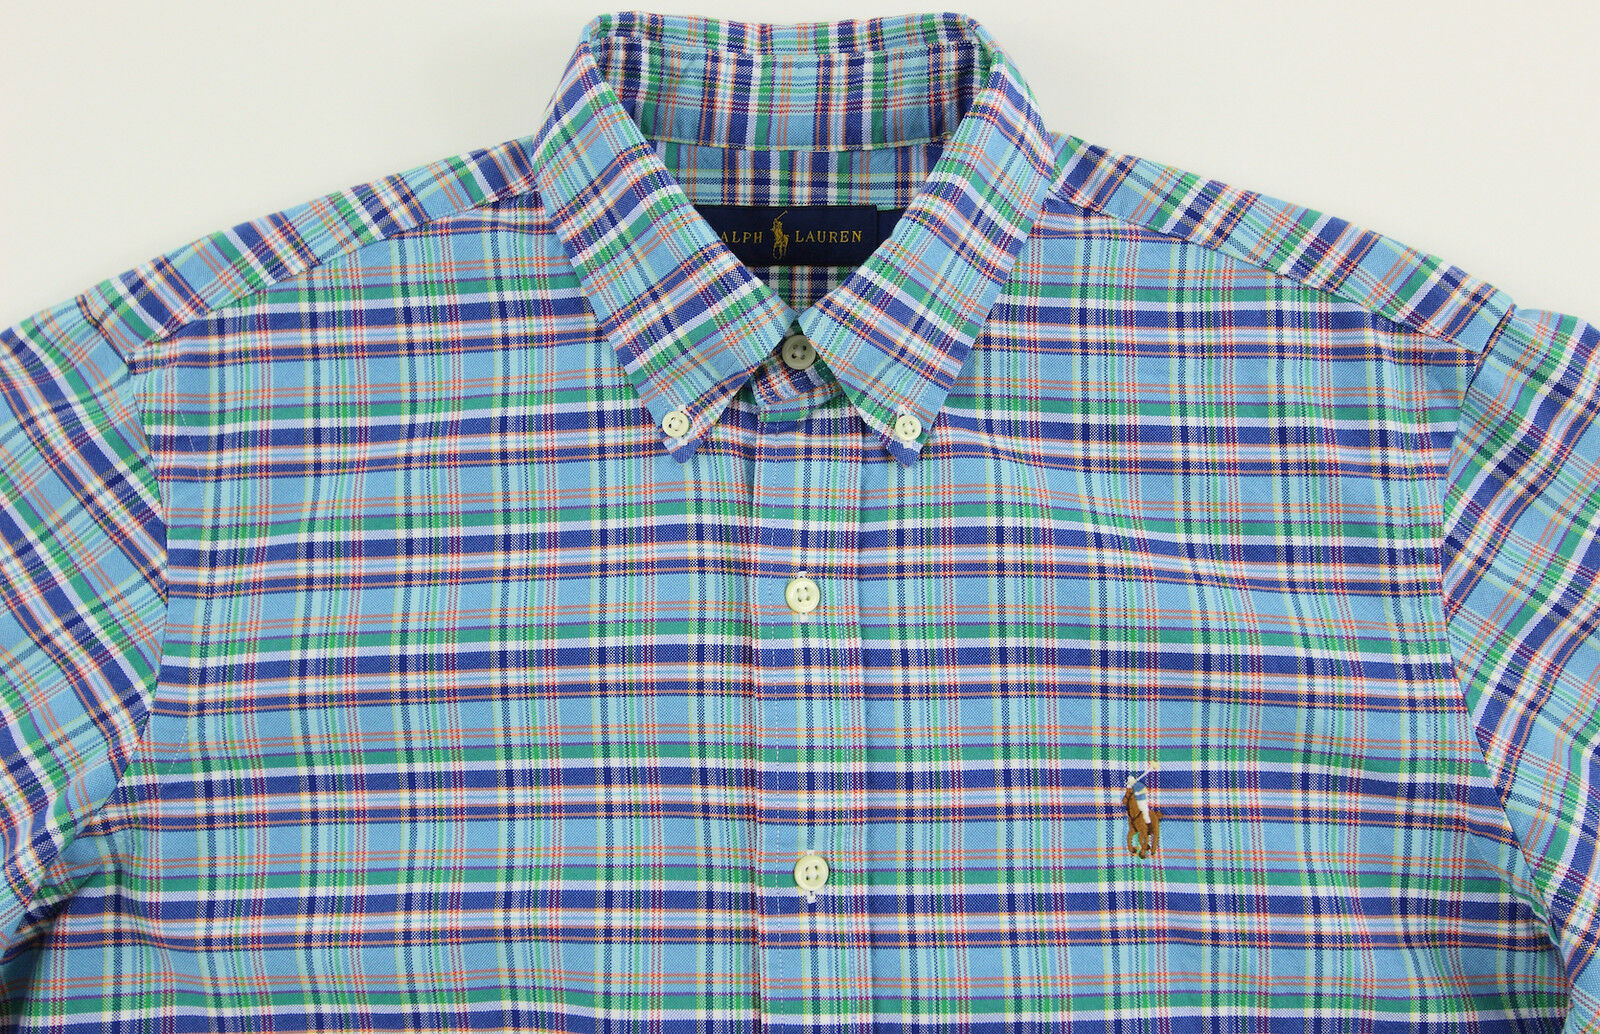 Men's RALPH LAUREN bluee colors Oxford Plaid Shirt 2XB 2X 2XL BIG NWT NEW Nice